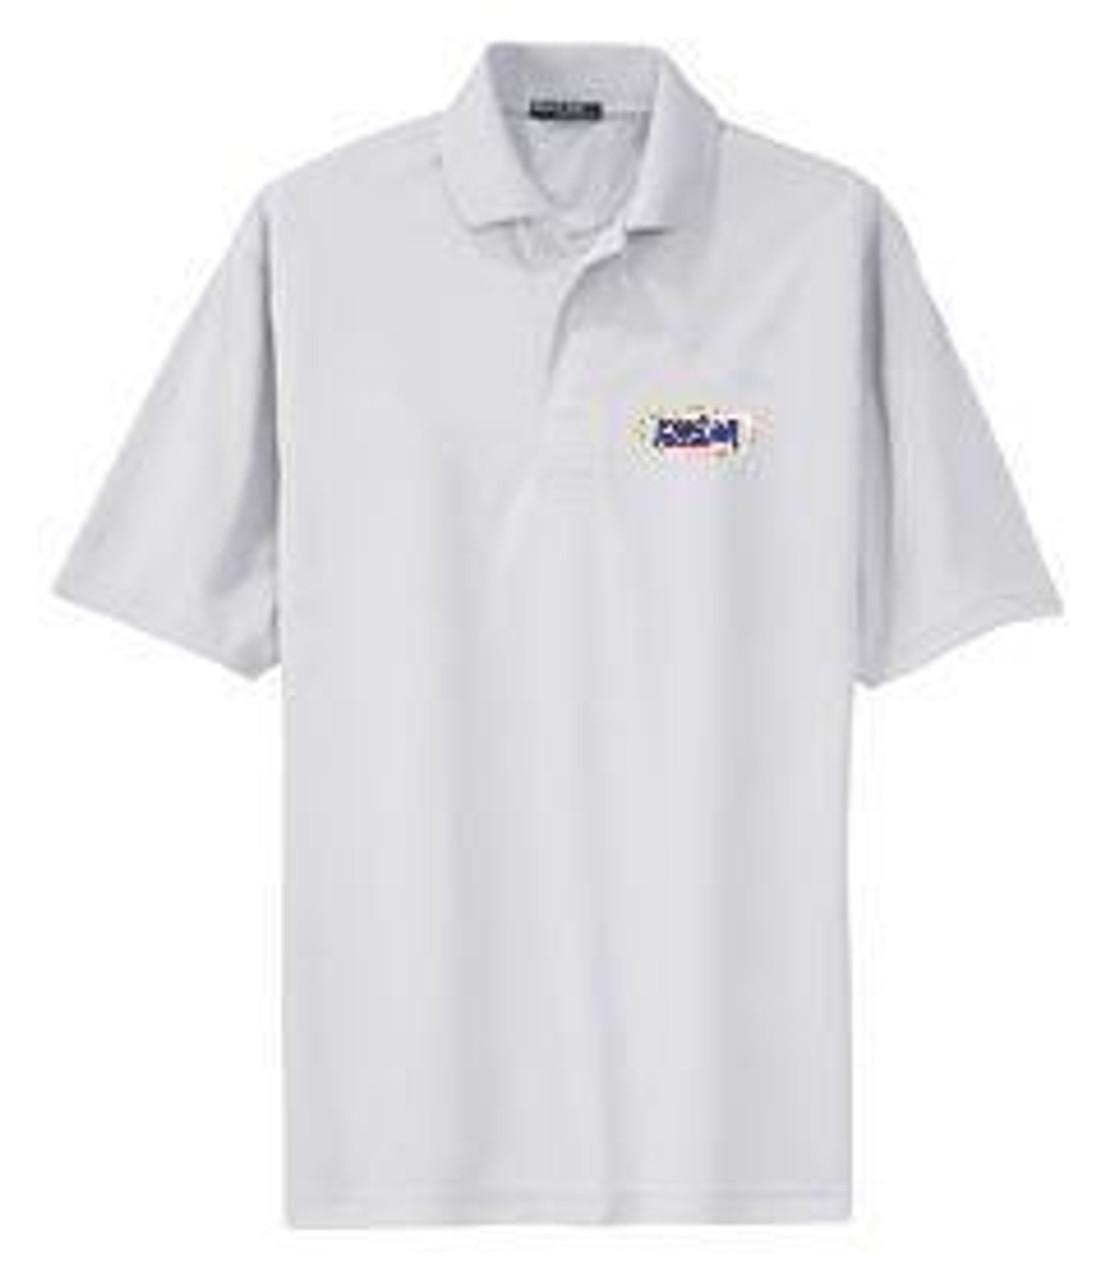 KHSAA Dye Sublimated Volleyball & Swimming Referee Shirt